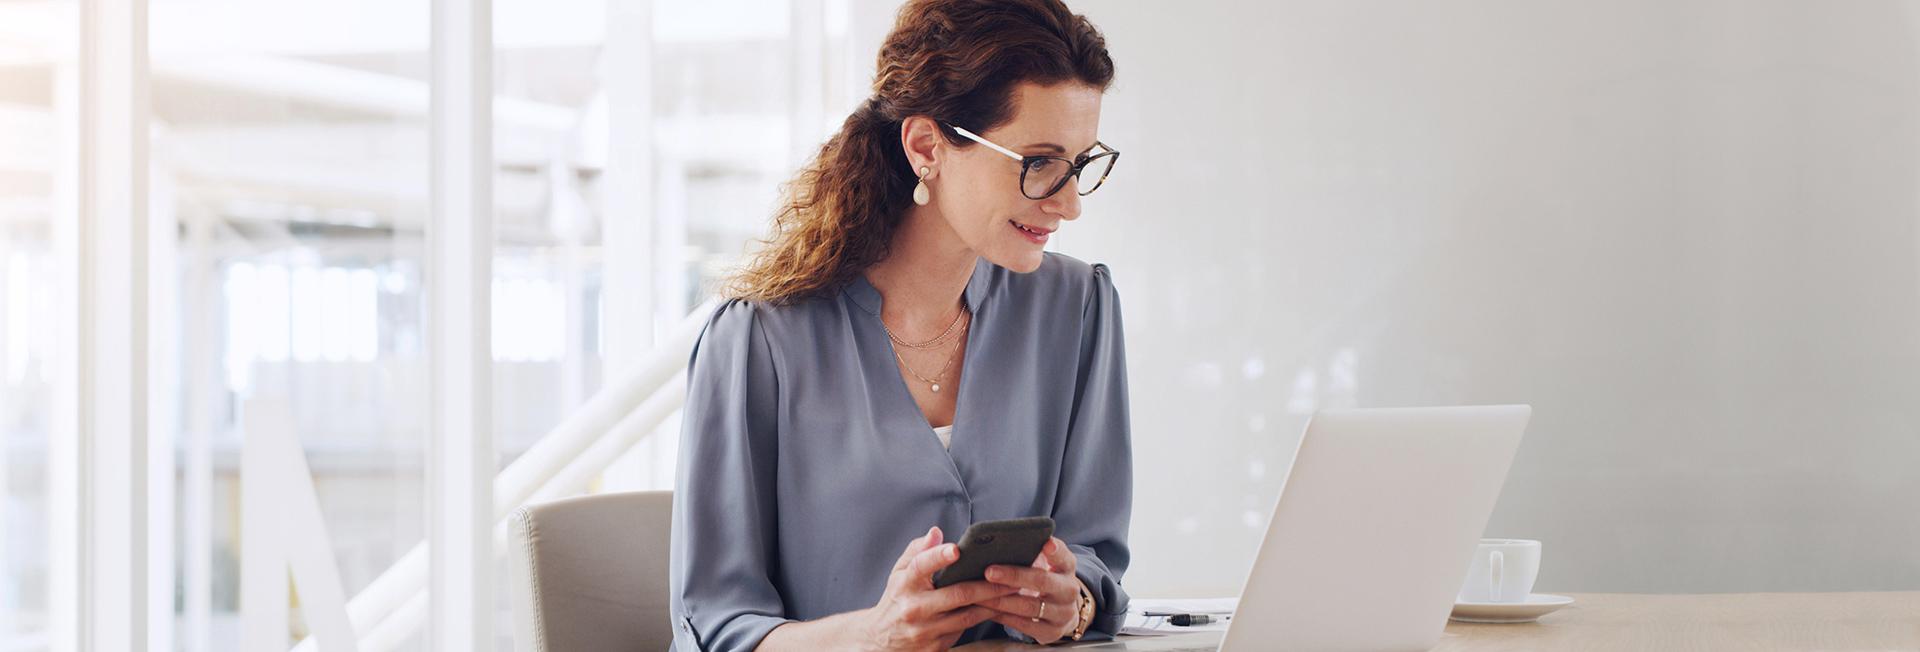 shopping for mastectomy bras online